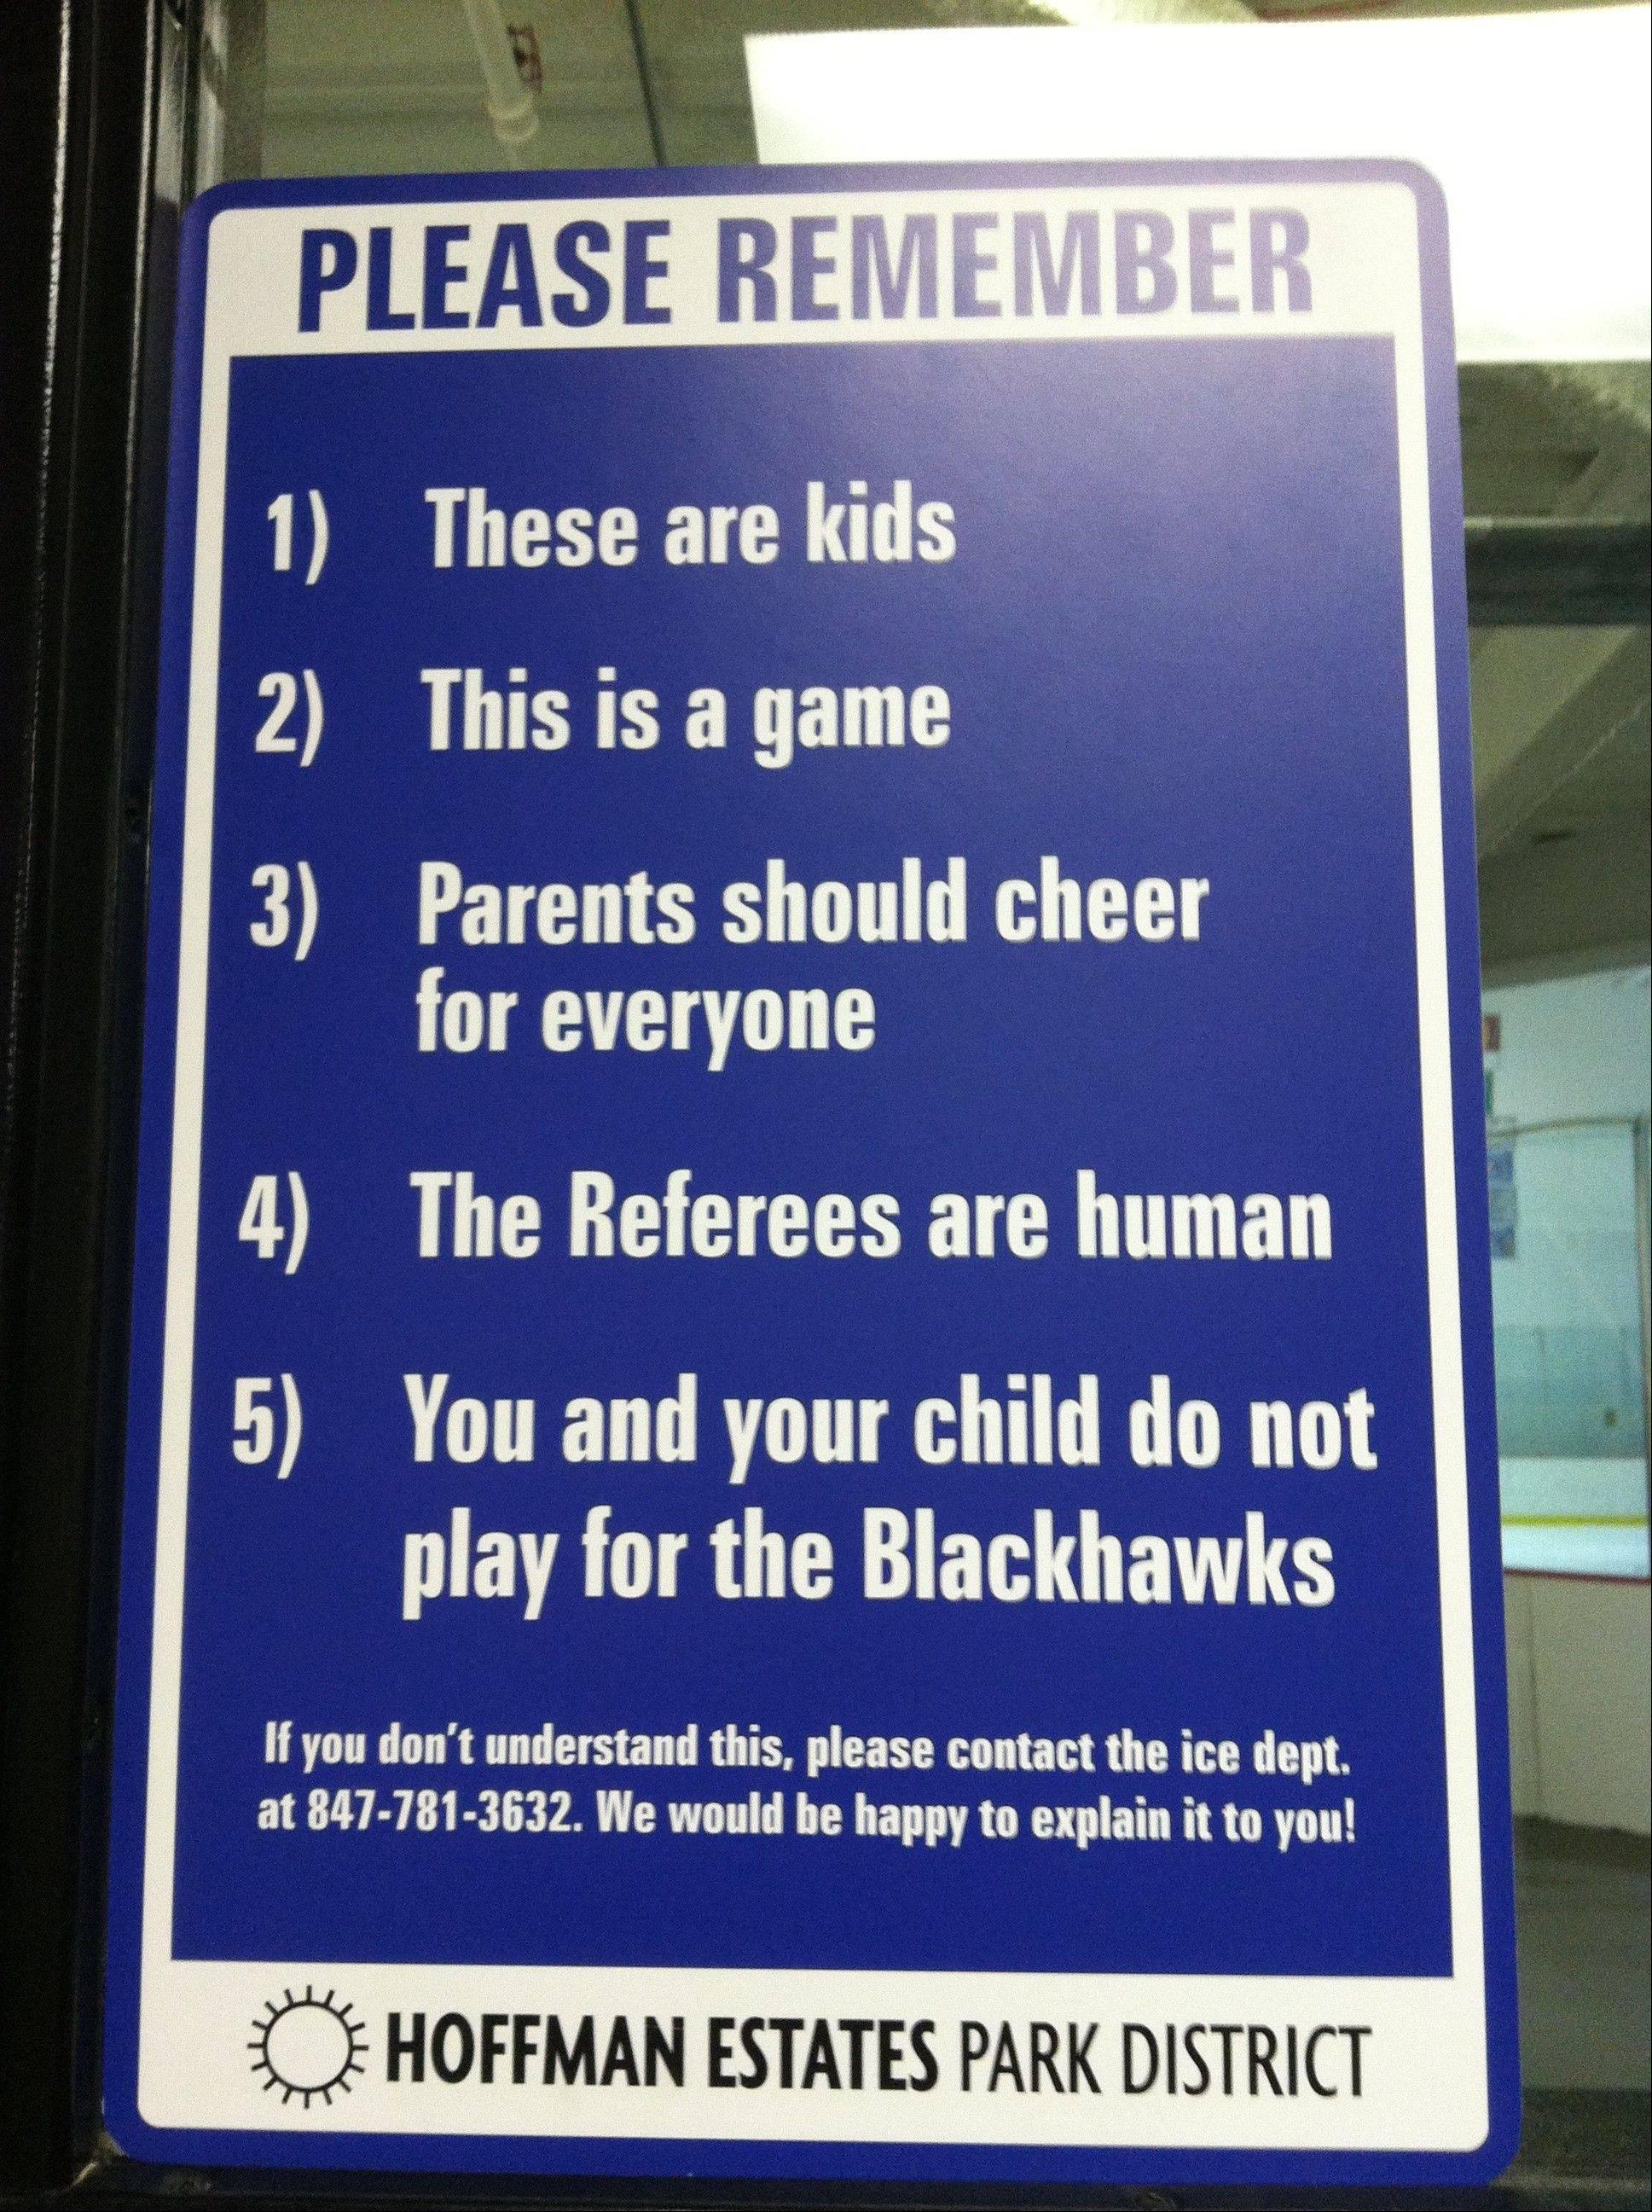 sportsmanship signs at hoffman estates ice rinks go viral